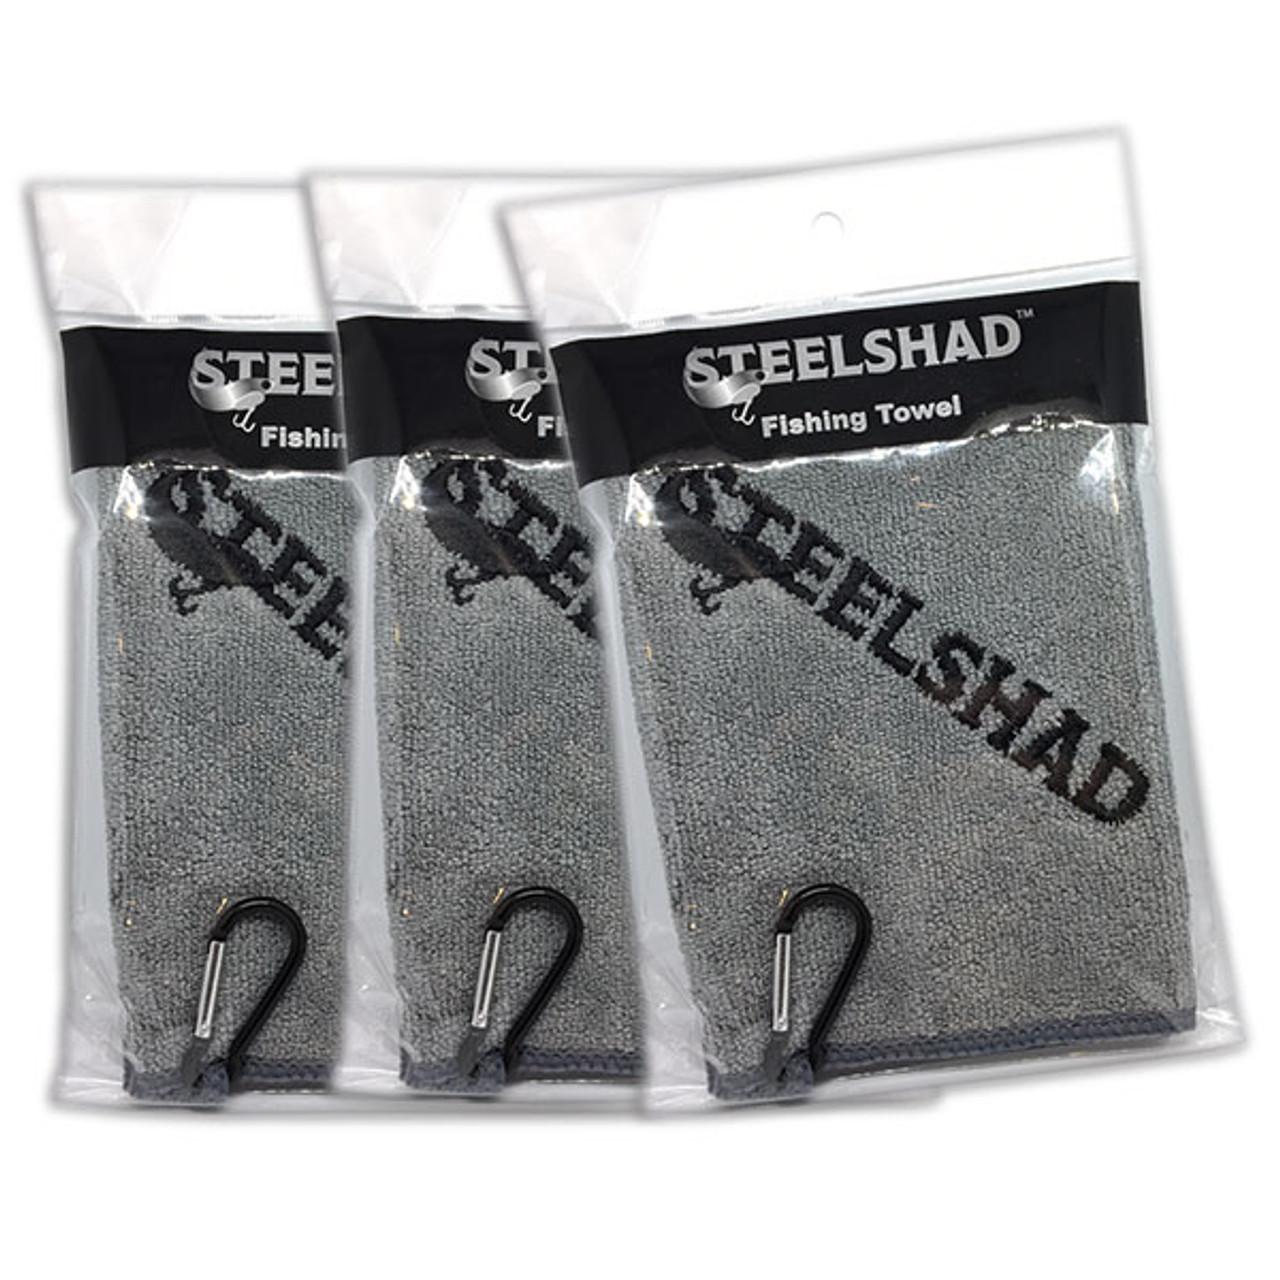 SteelShad Fishing Towel - 3 Pack